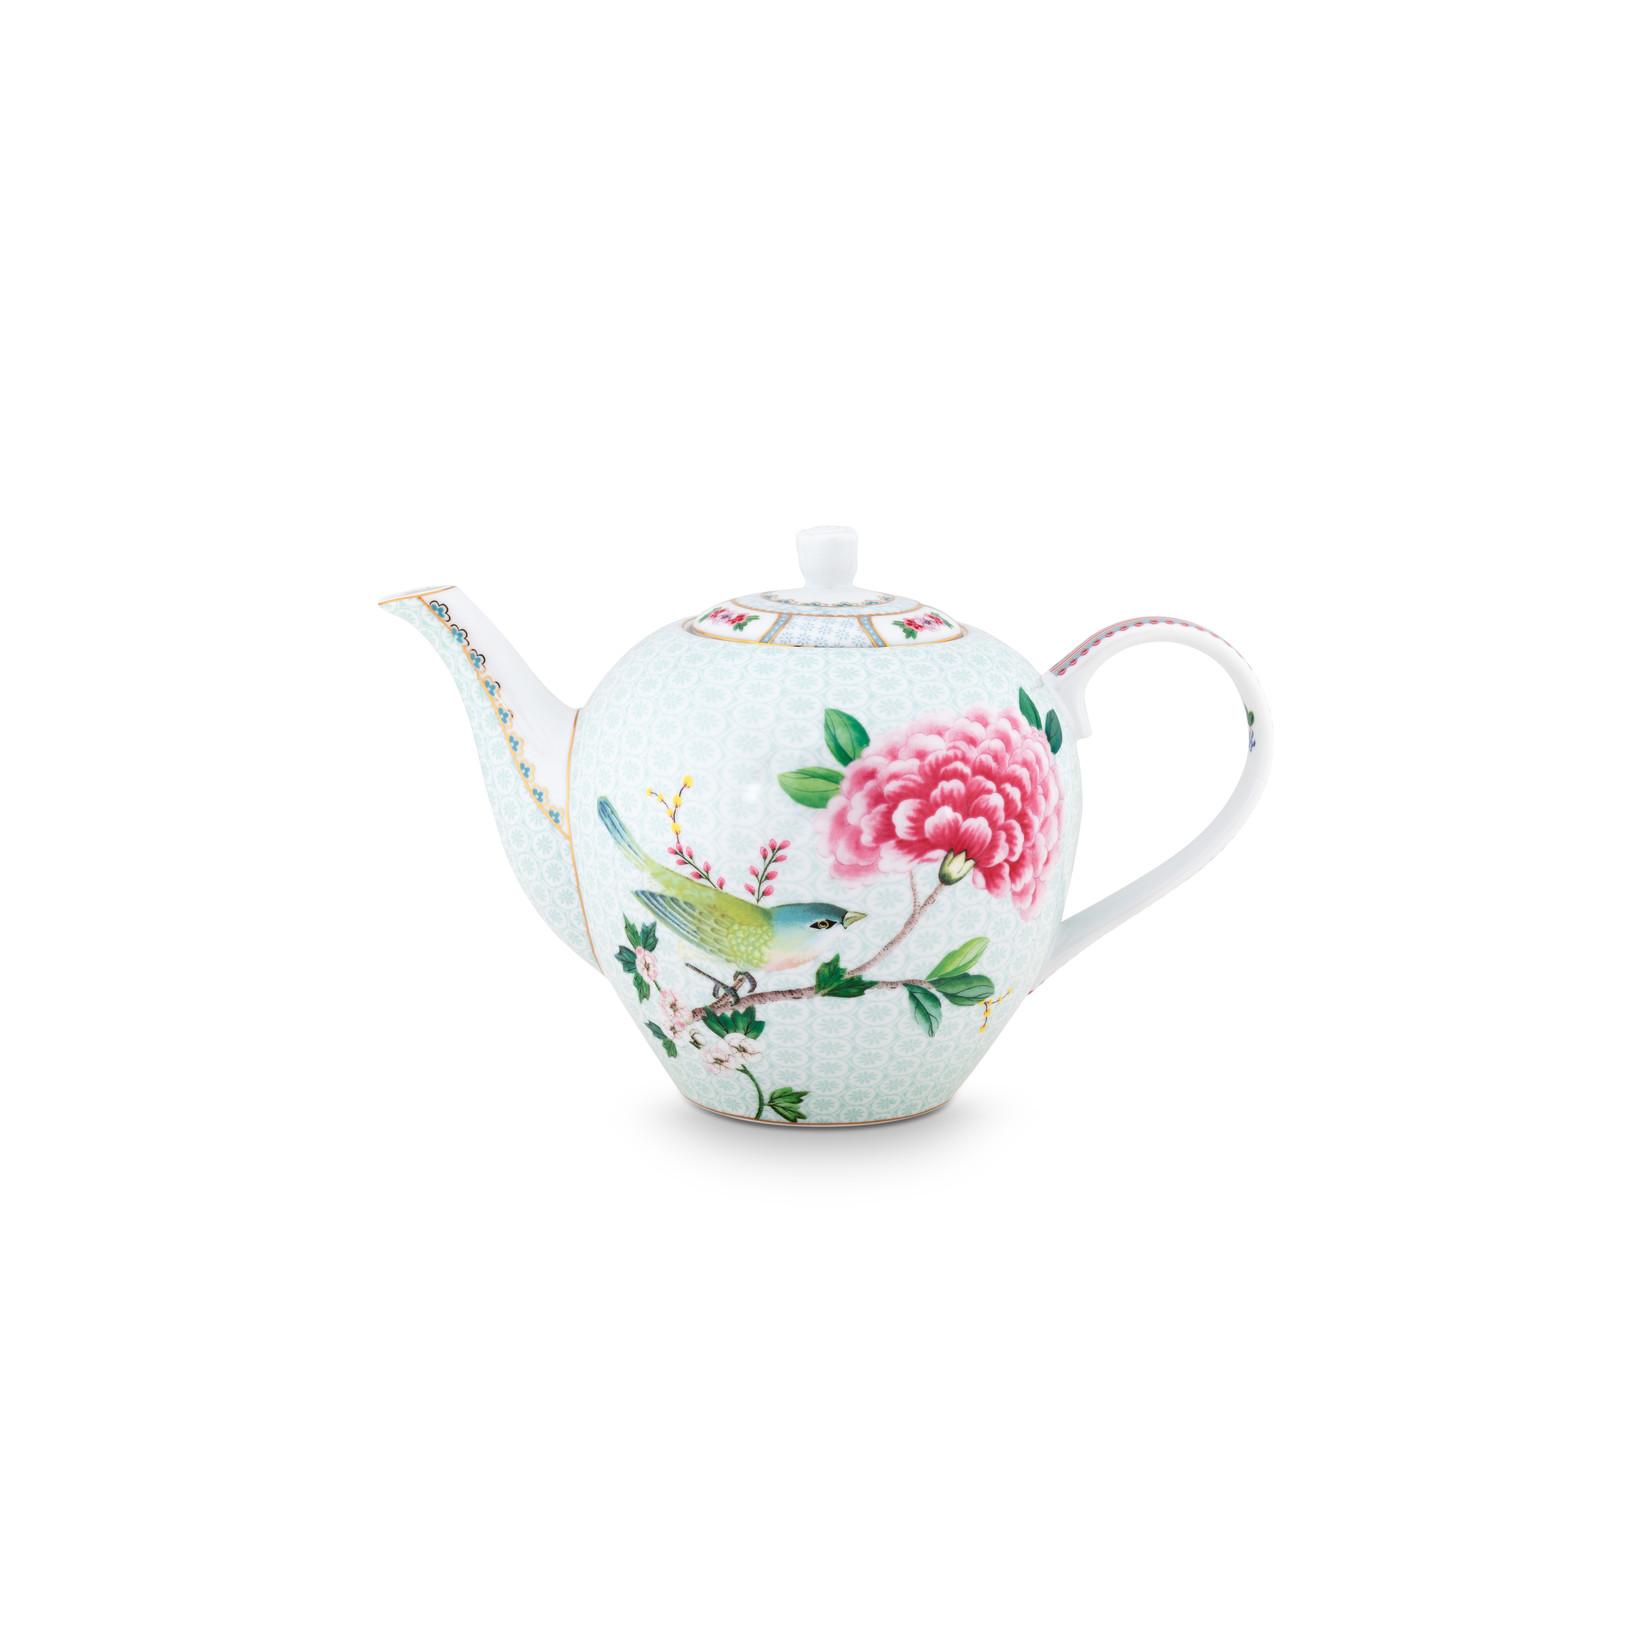 PIP Studio Tea Pot Large Blushing Birds White 1.6ltr